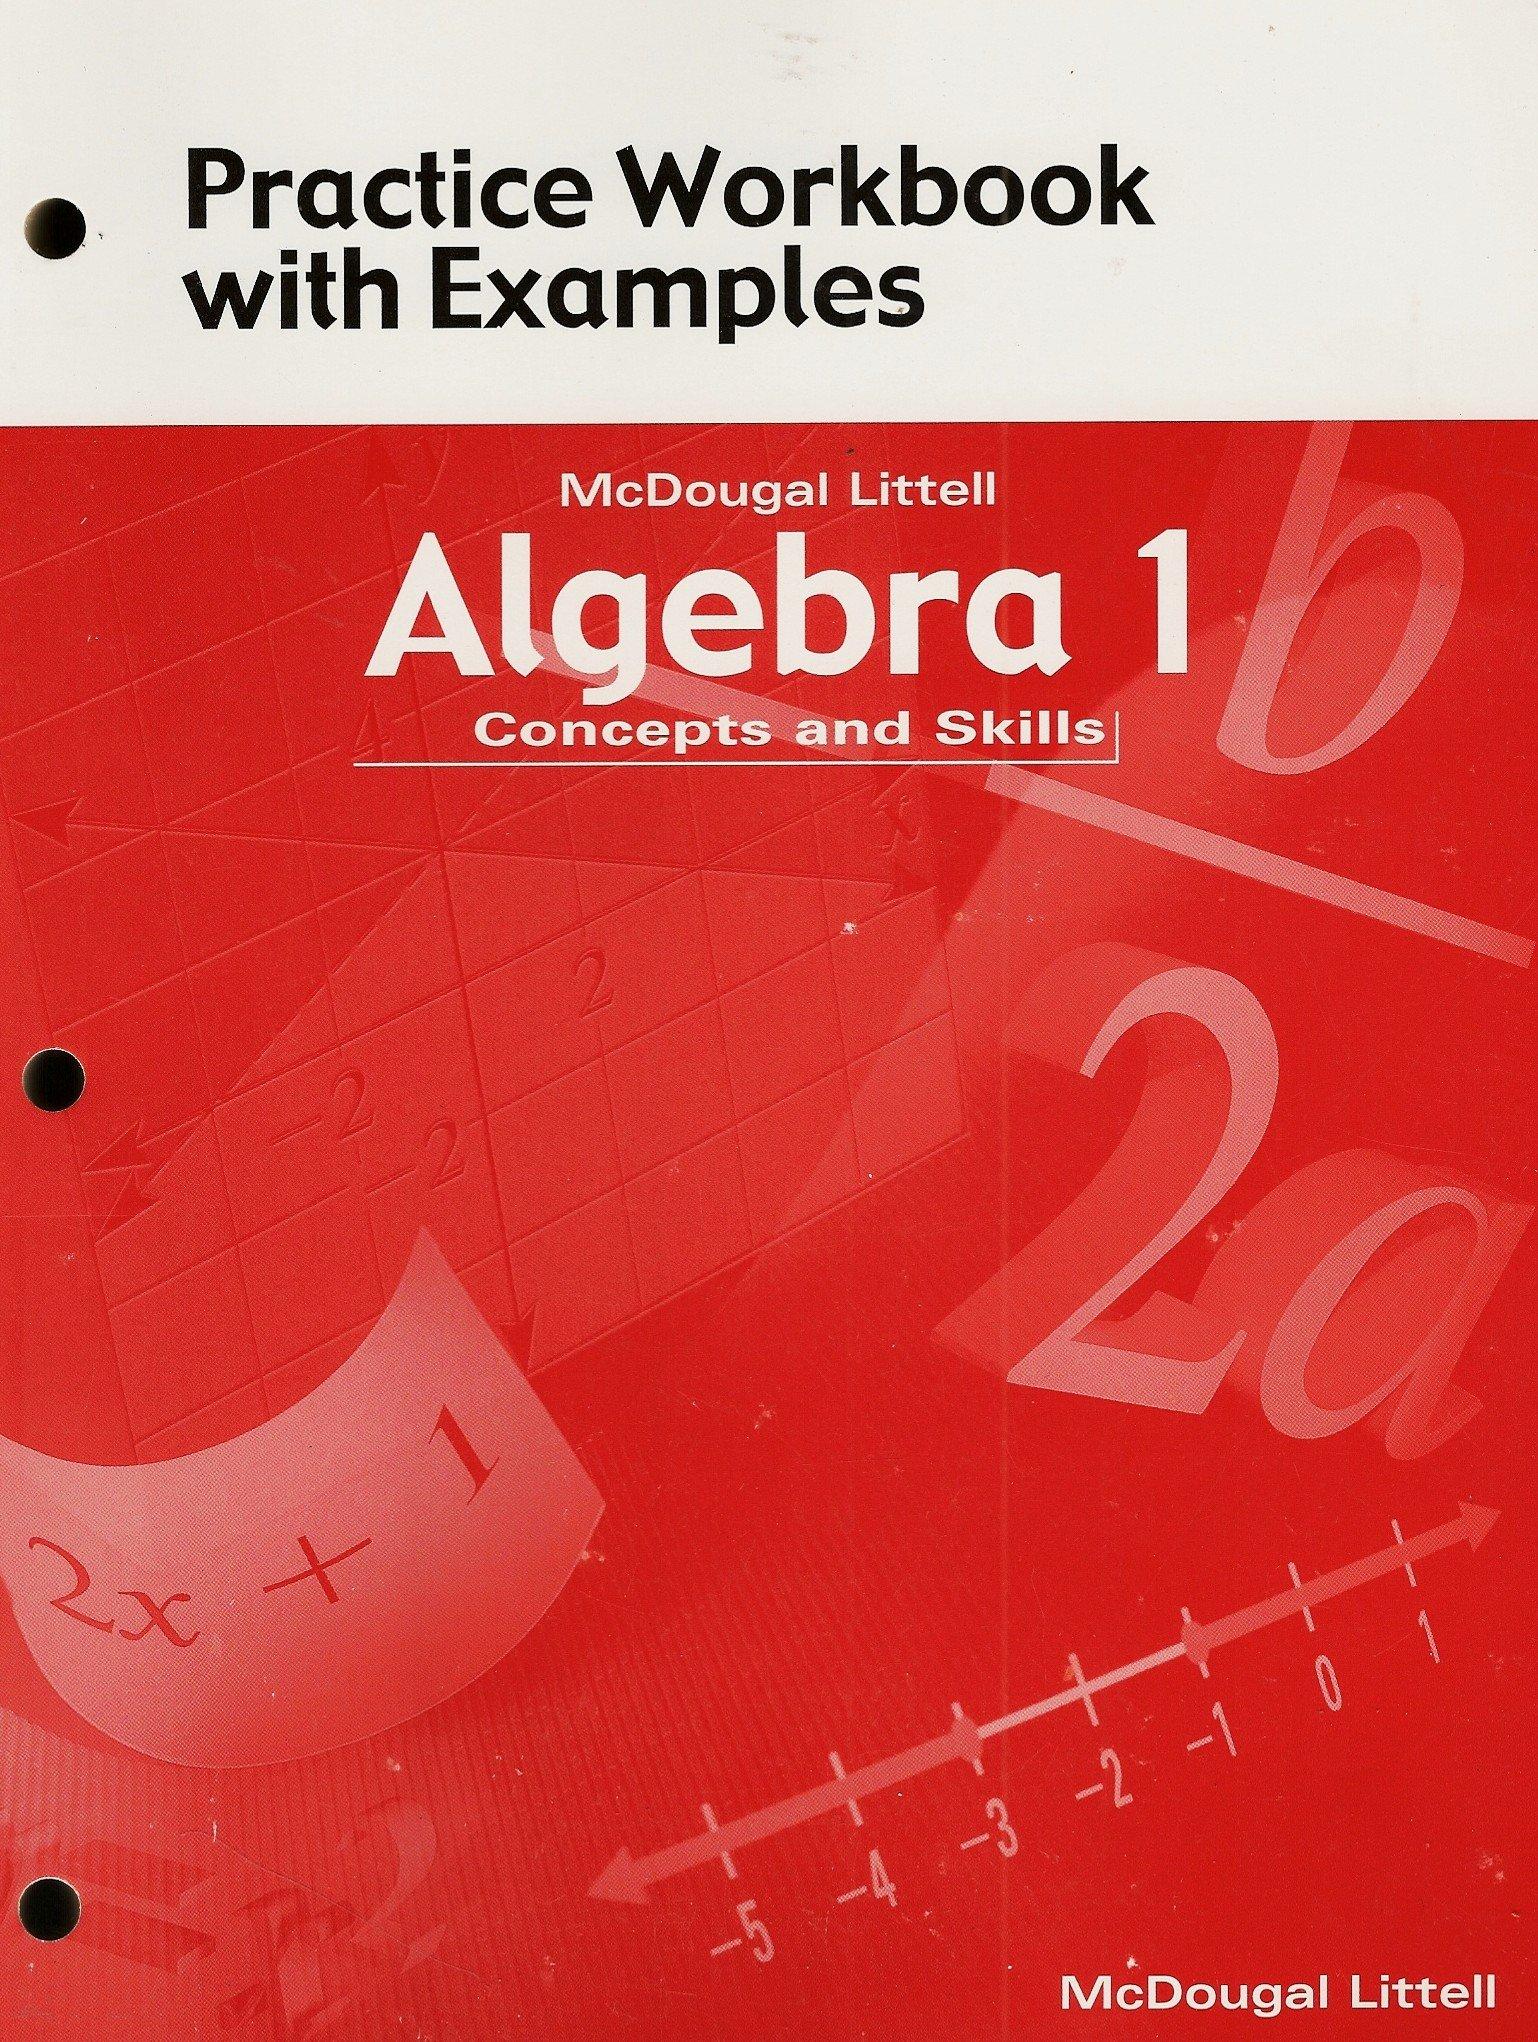 Amazon McDougal Littell Algebra 1 Concepts and Skills – Mcdougal Littell Algebra 1 Worksheet Answers